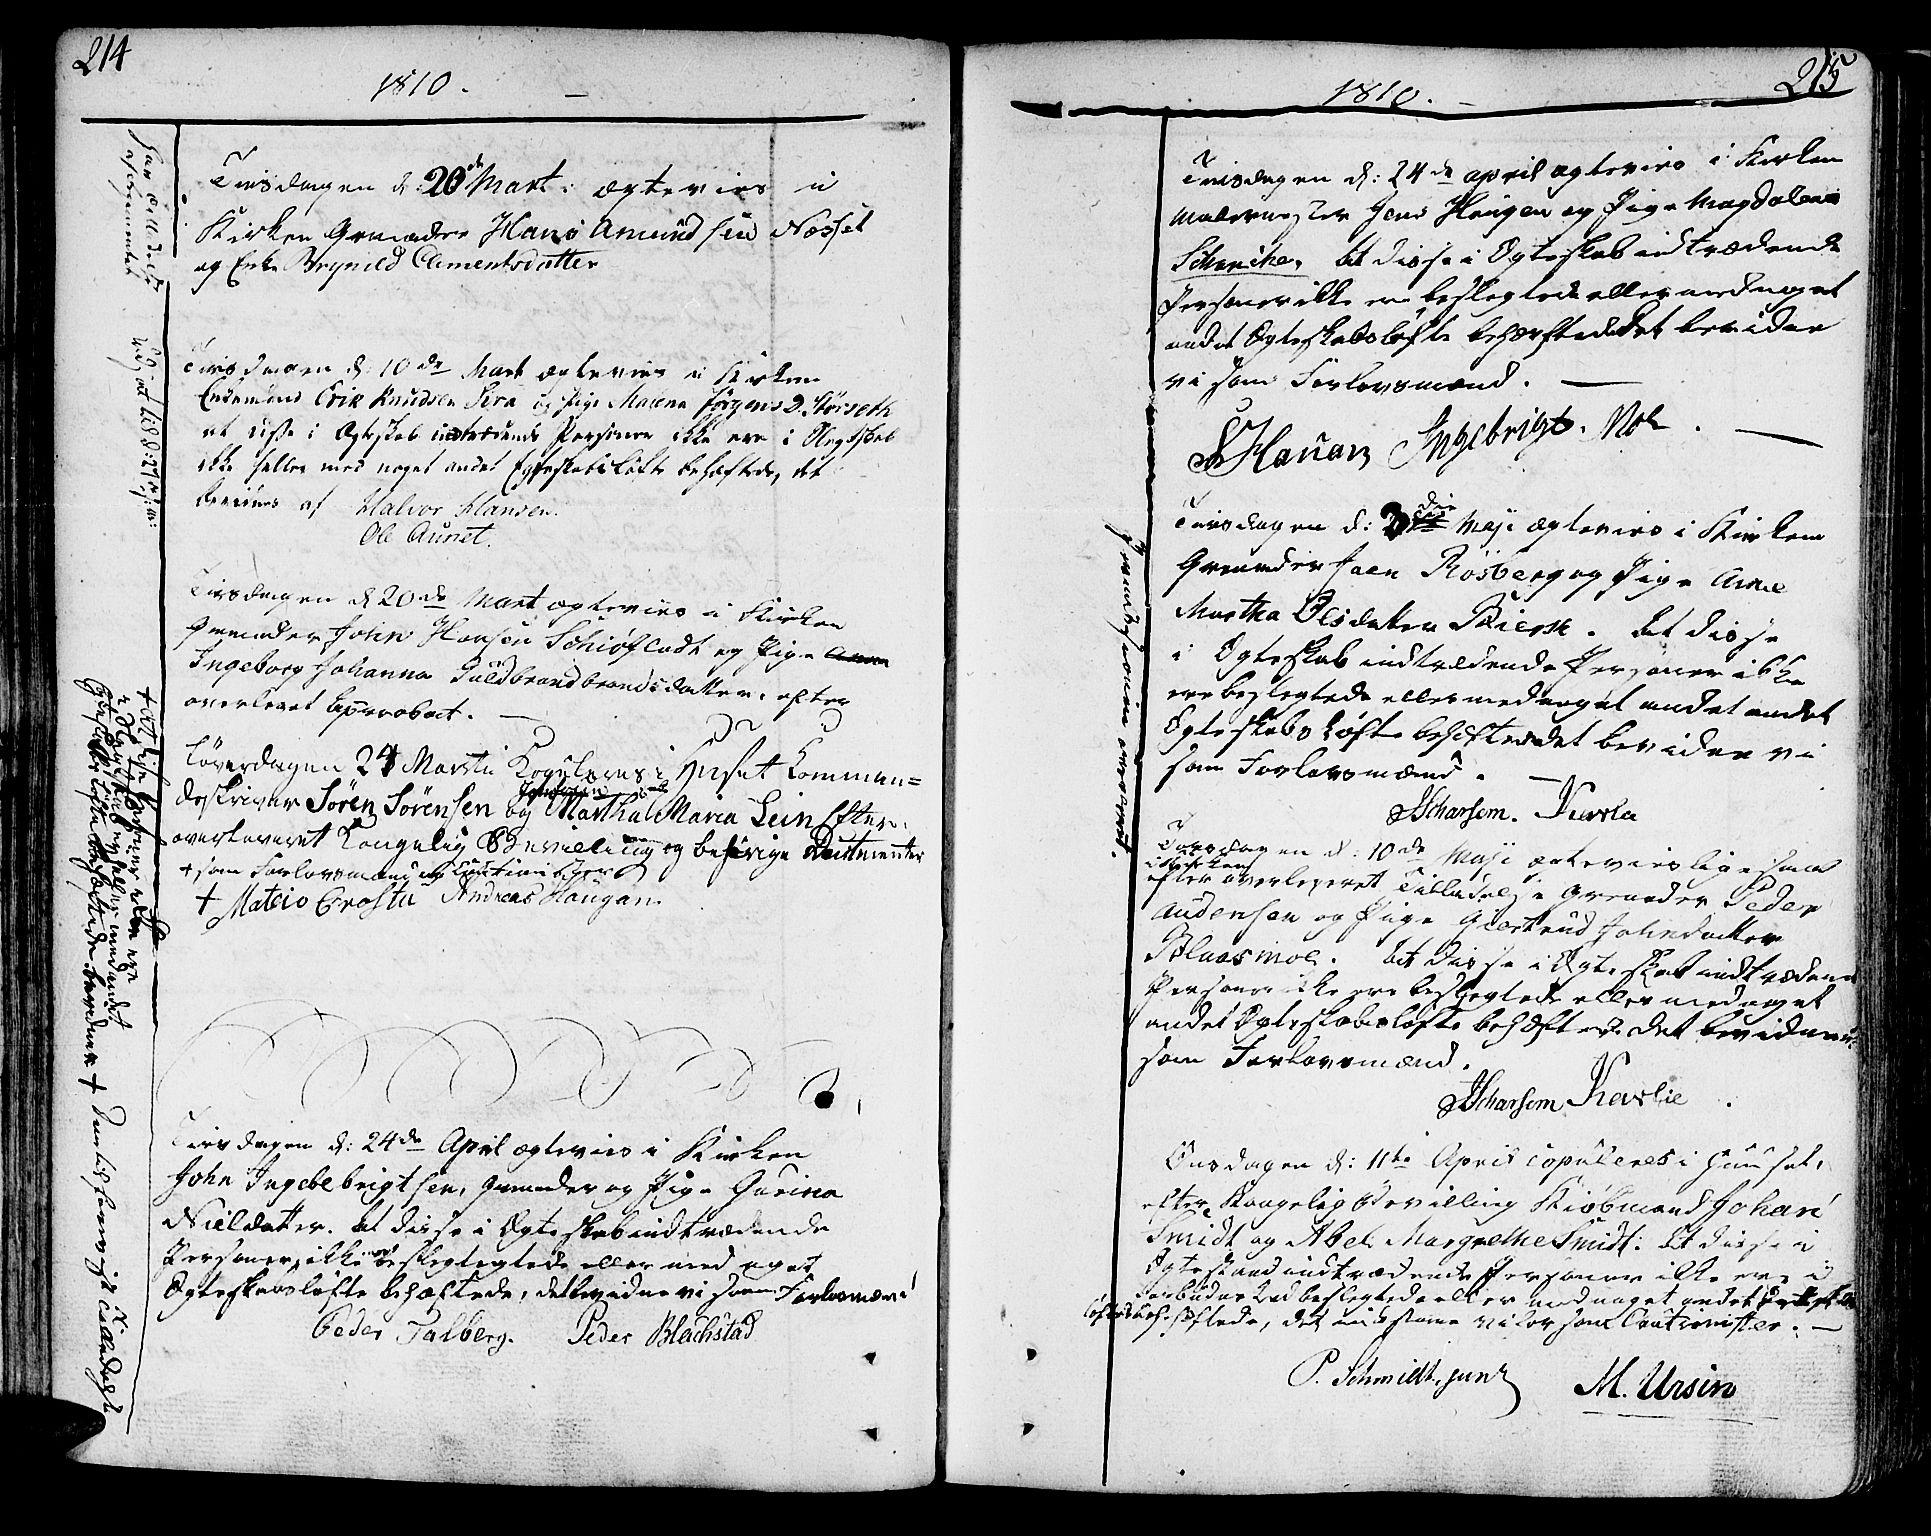 SAT, Ministerialprotokoller, klokkerbøker og fødselsregistre - Sør-Trøndelag, 602/L0105: Parish register (official) no. 602A03, 1774-1814, p. 214-215